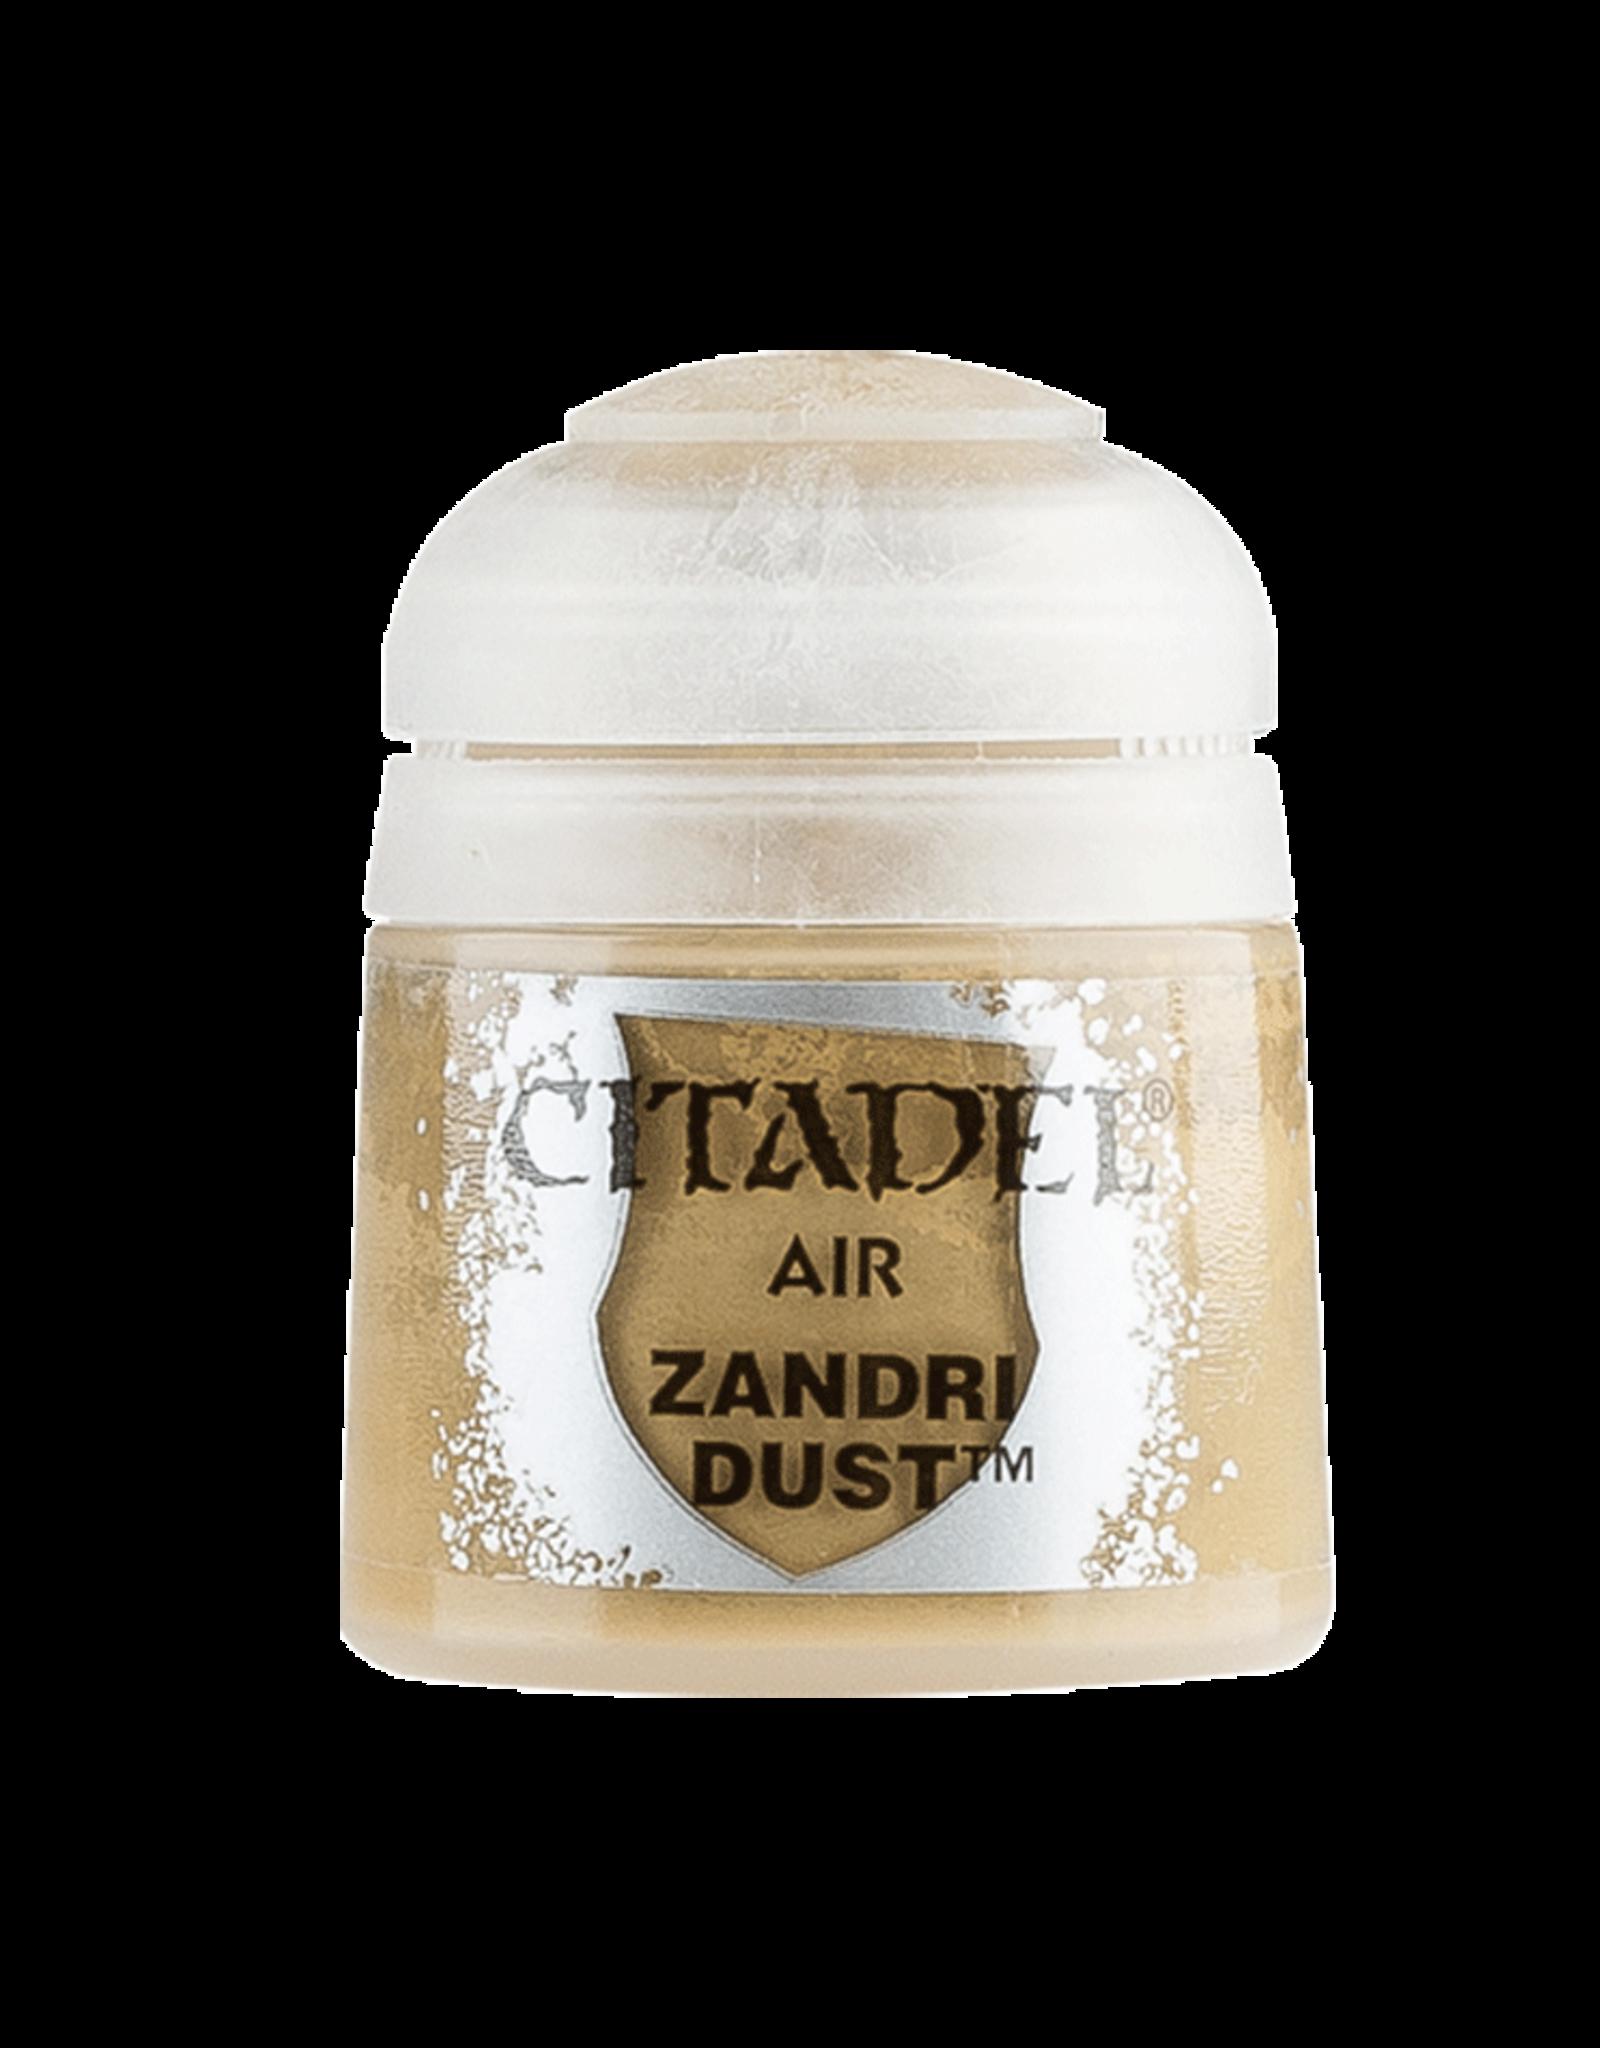 Games Workshop Citadel Air: Zandri Dust (24ml)